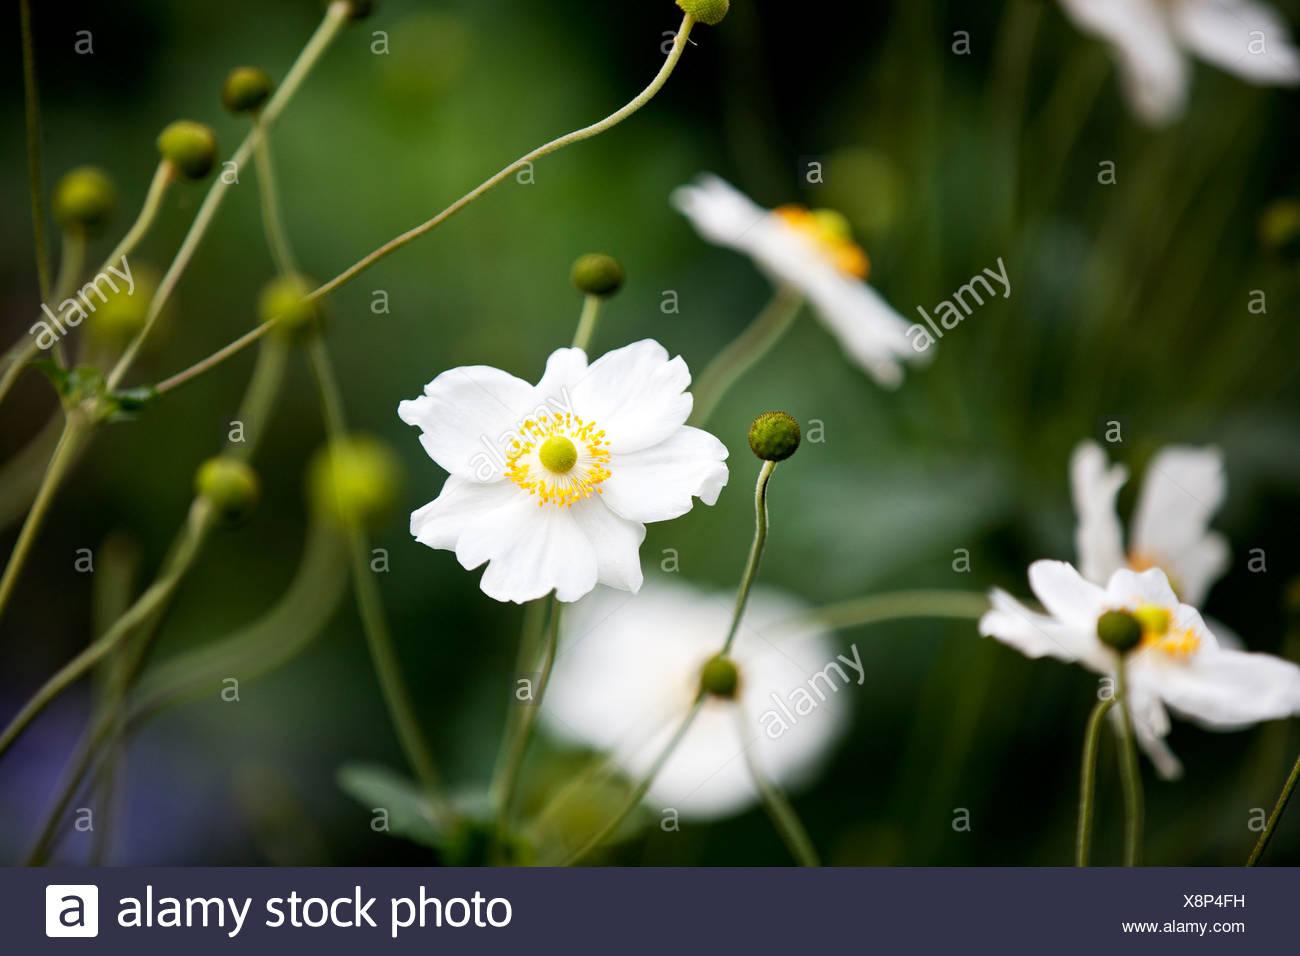 White Japanese Anemone Flowers Stock Photo 280769653 Alamy